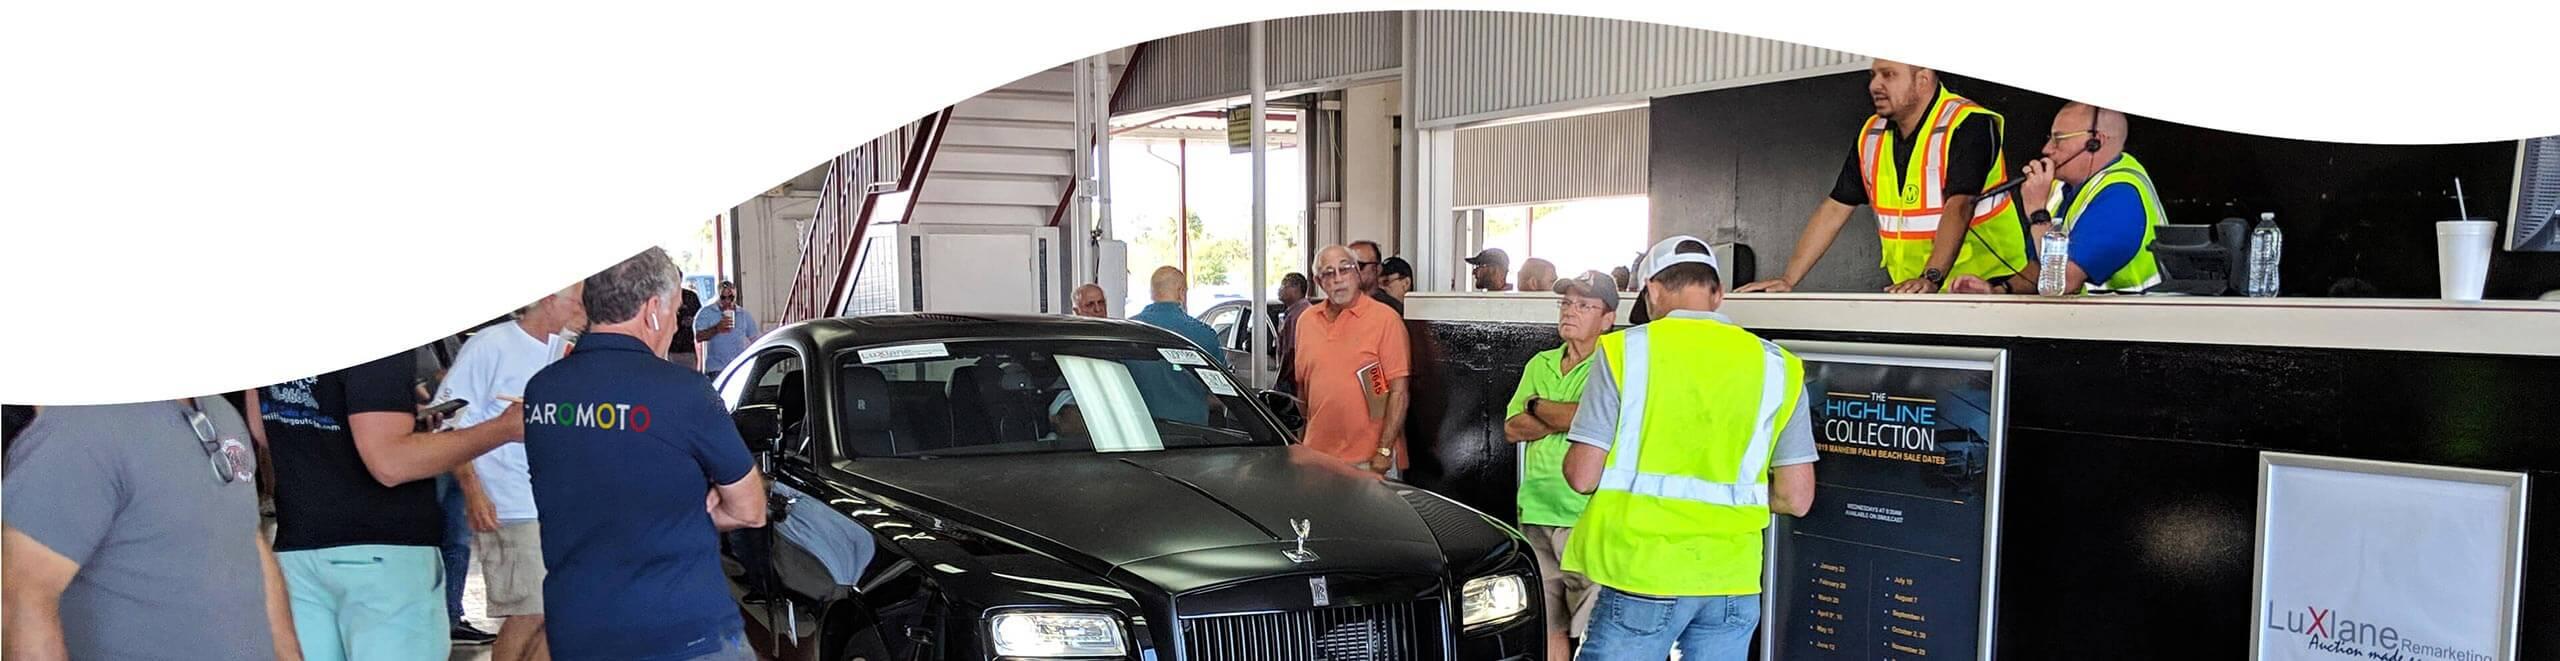 Southern Chrysler Dodge Lufkin Tx >> Online Car Auctions Manheim Adesa Copart Iaai